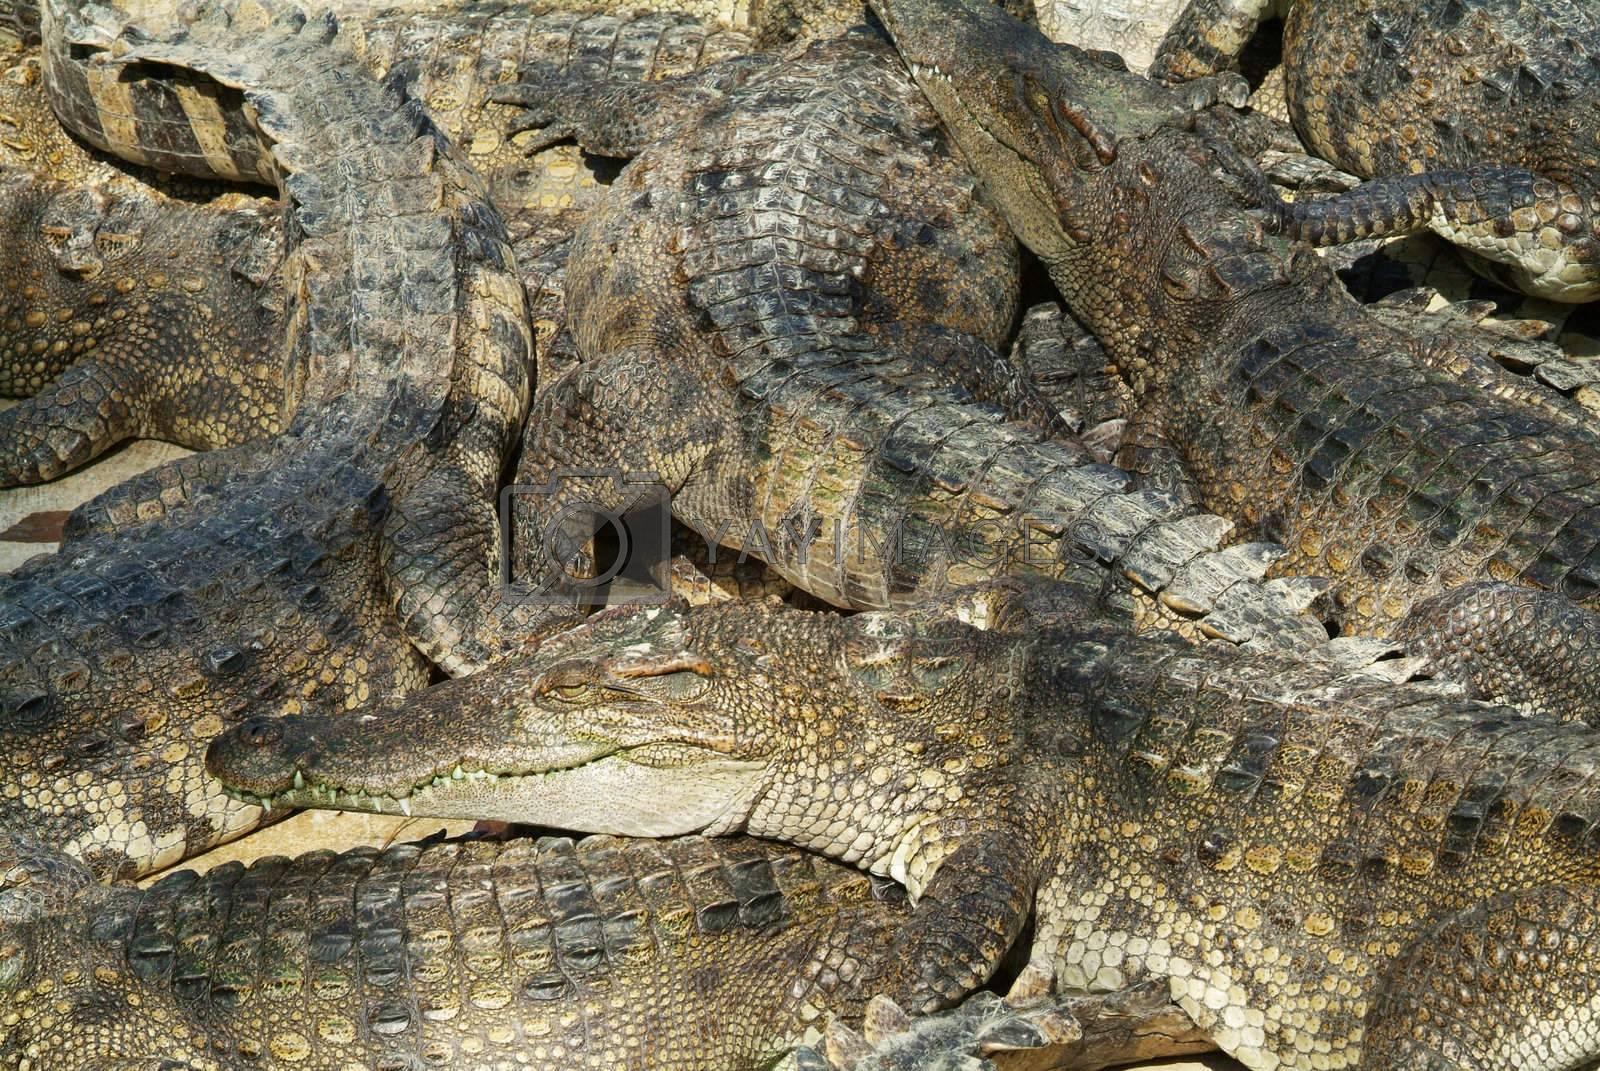 Crocodile abstract by epixx